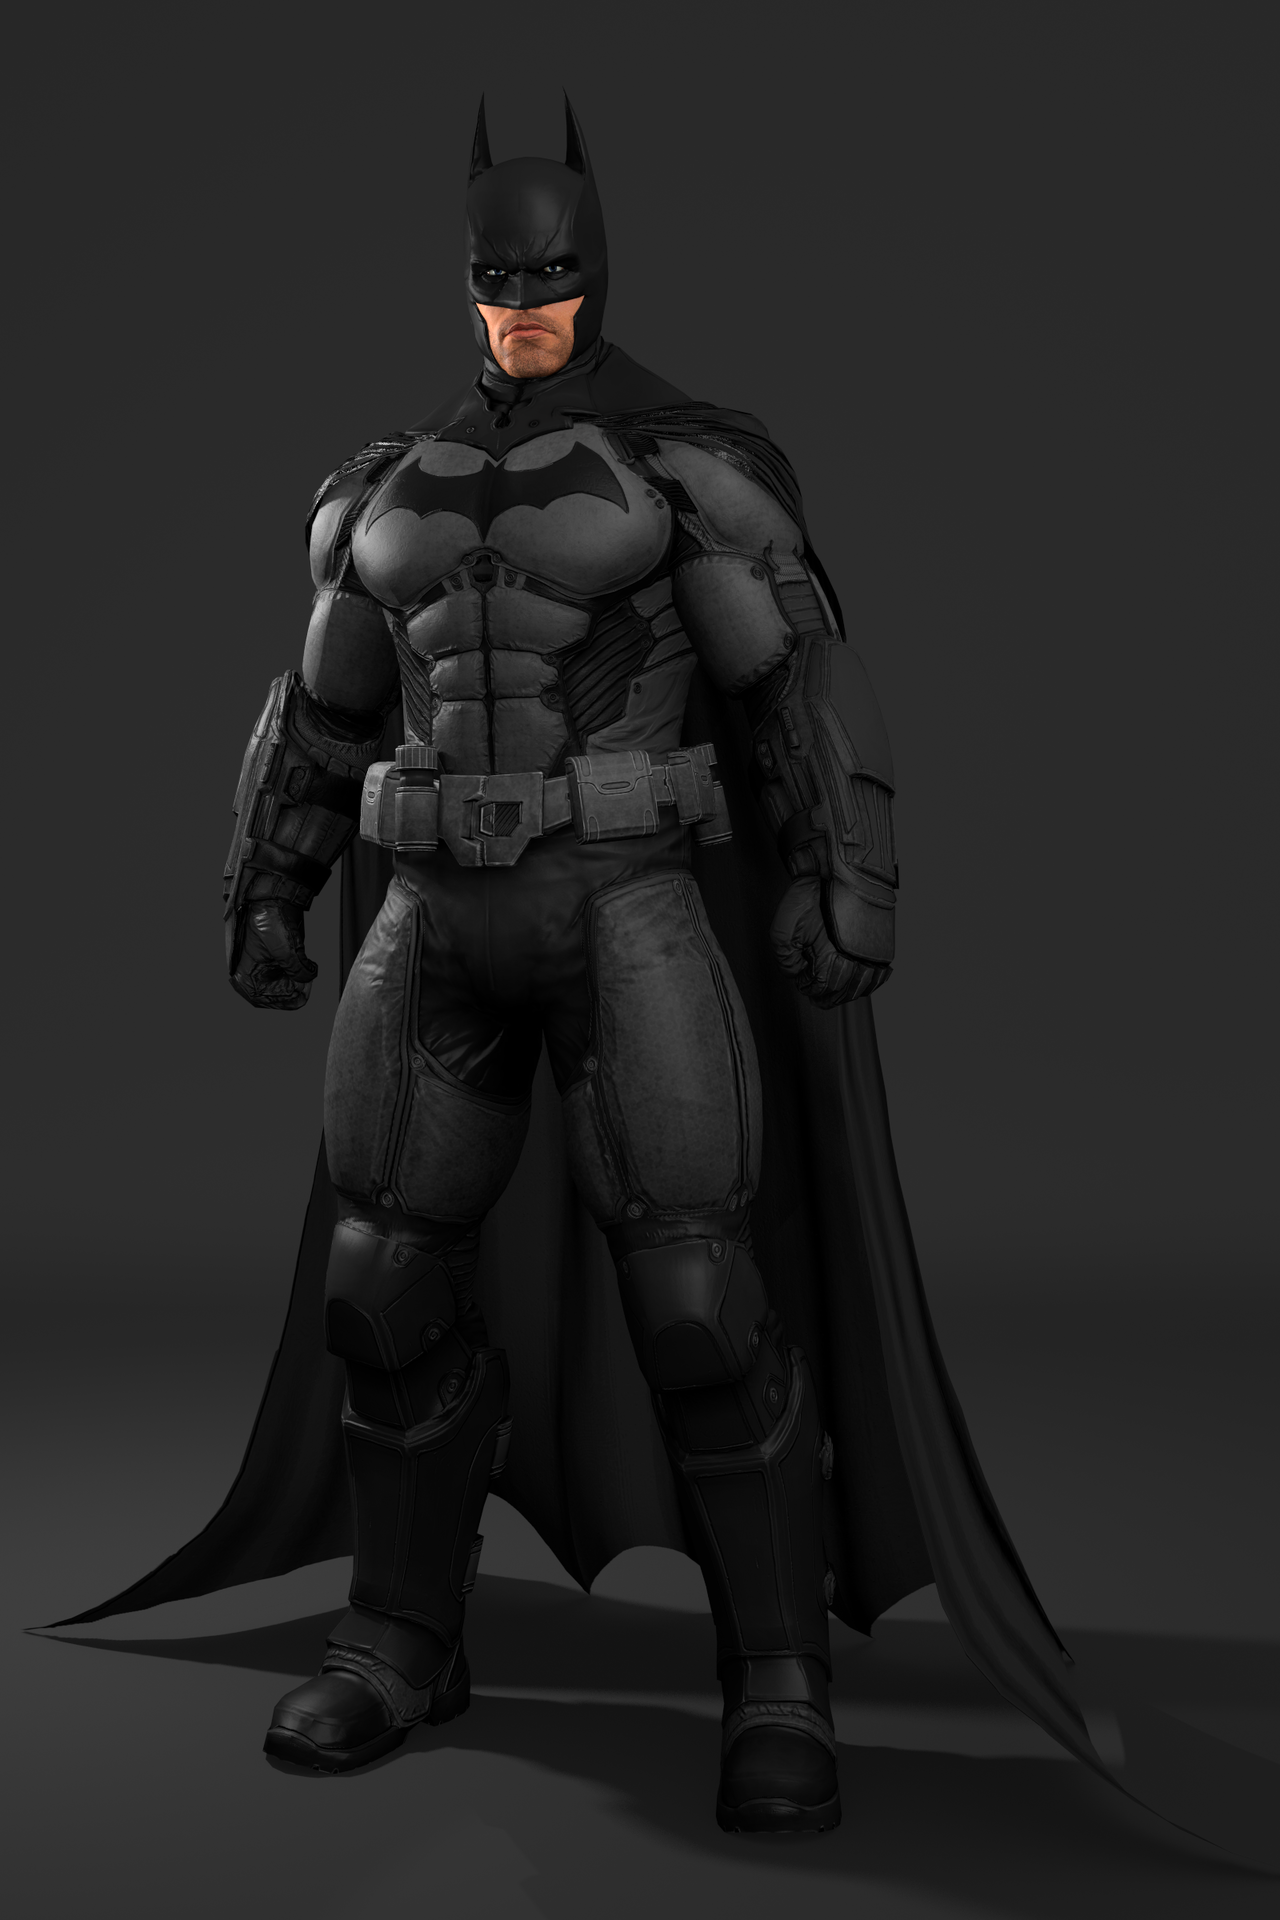 Batman Arkham City Crashing When Jump Off Tallest Building Achievement